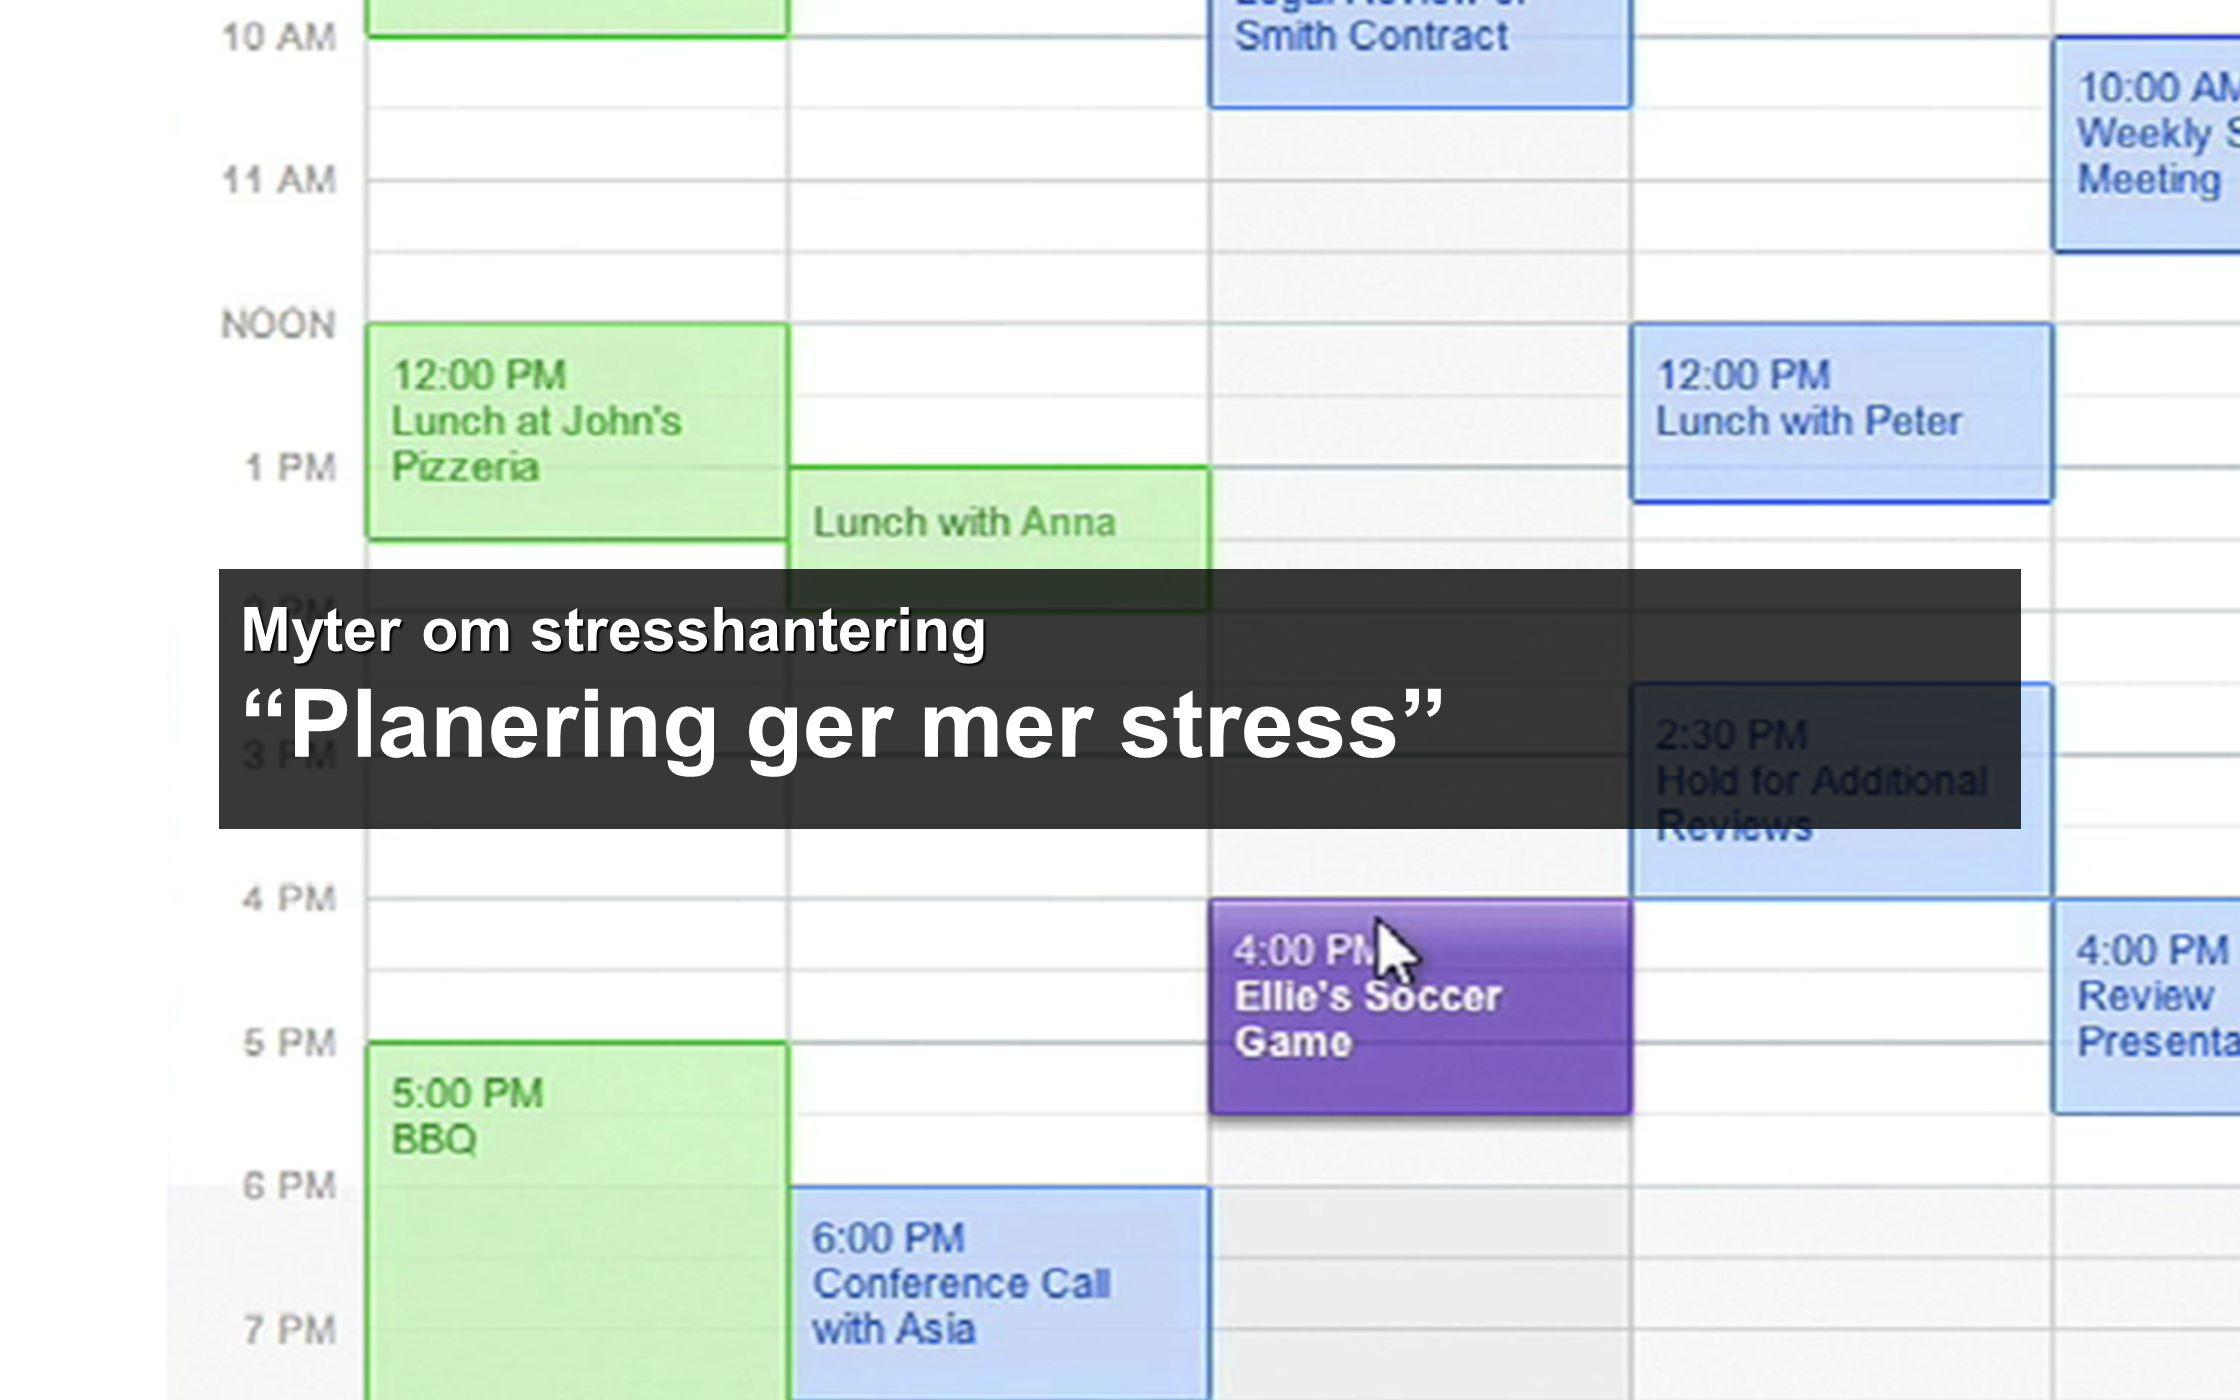 Myter om stresshantering Planering ger mer stress